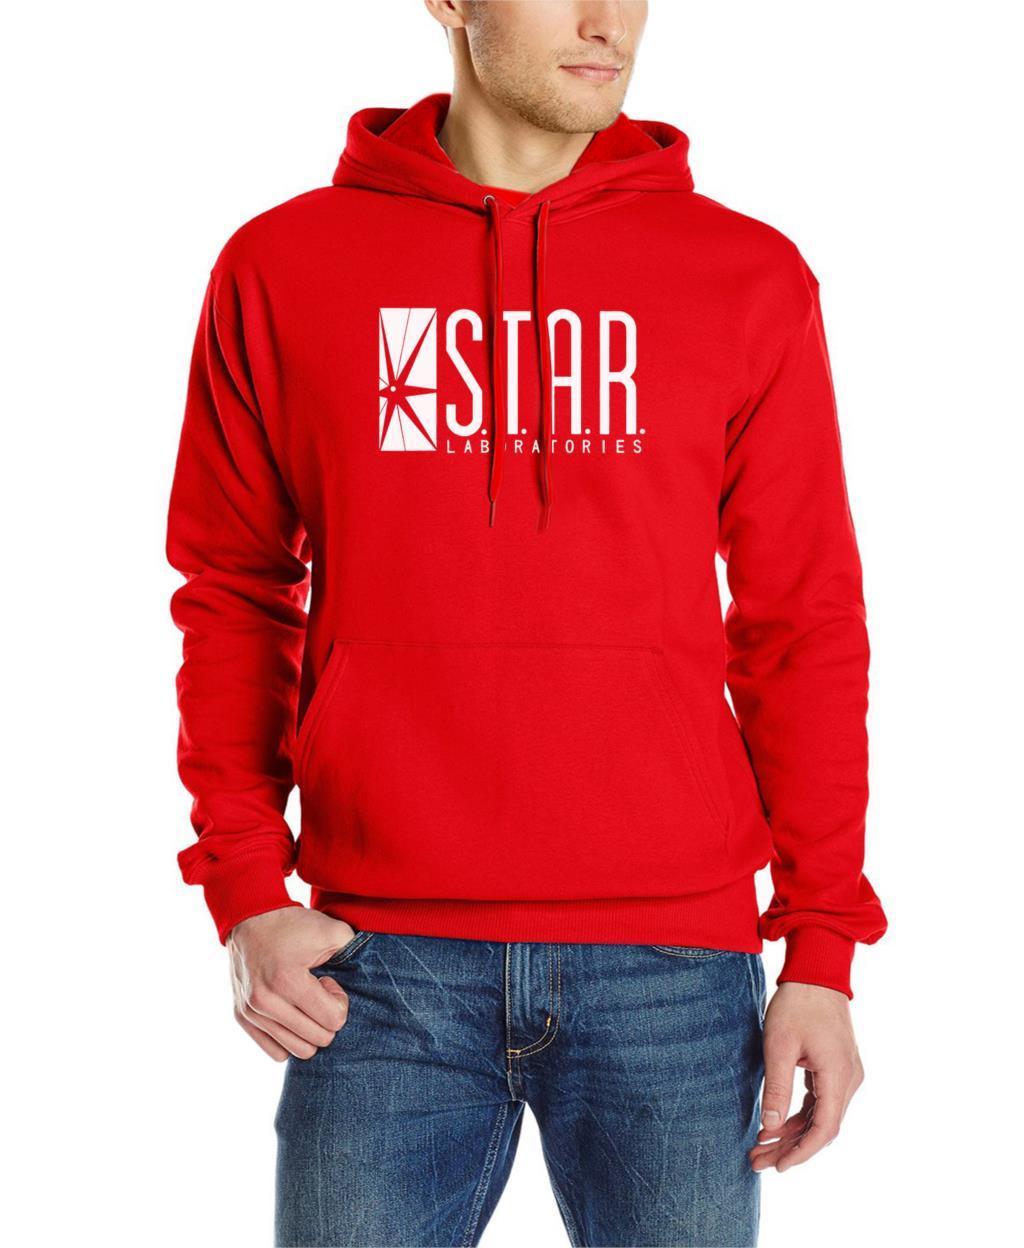 autumn brand hoodies superman series men hoody STAR S.T.A.R.labs jumper the flash gotham city comic books black sweatshirt 6